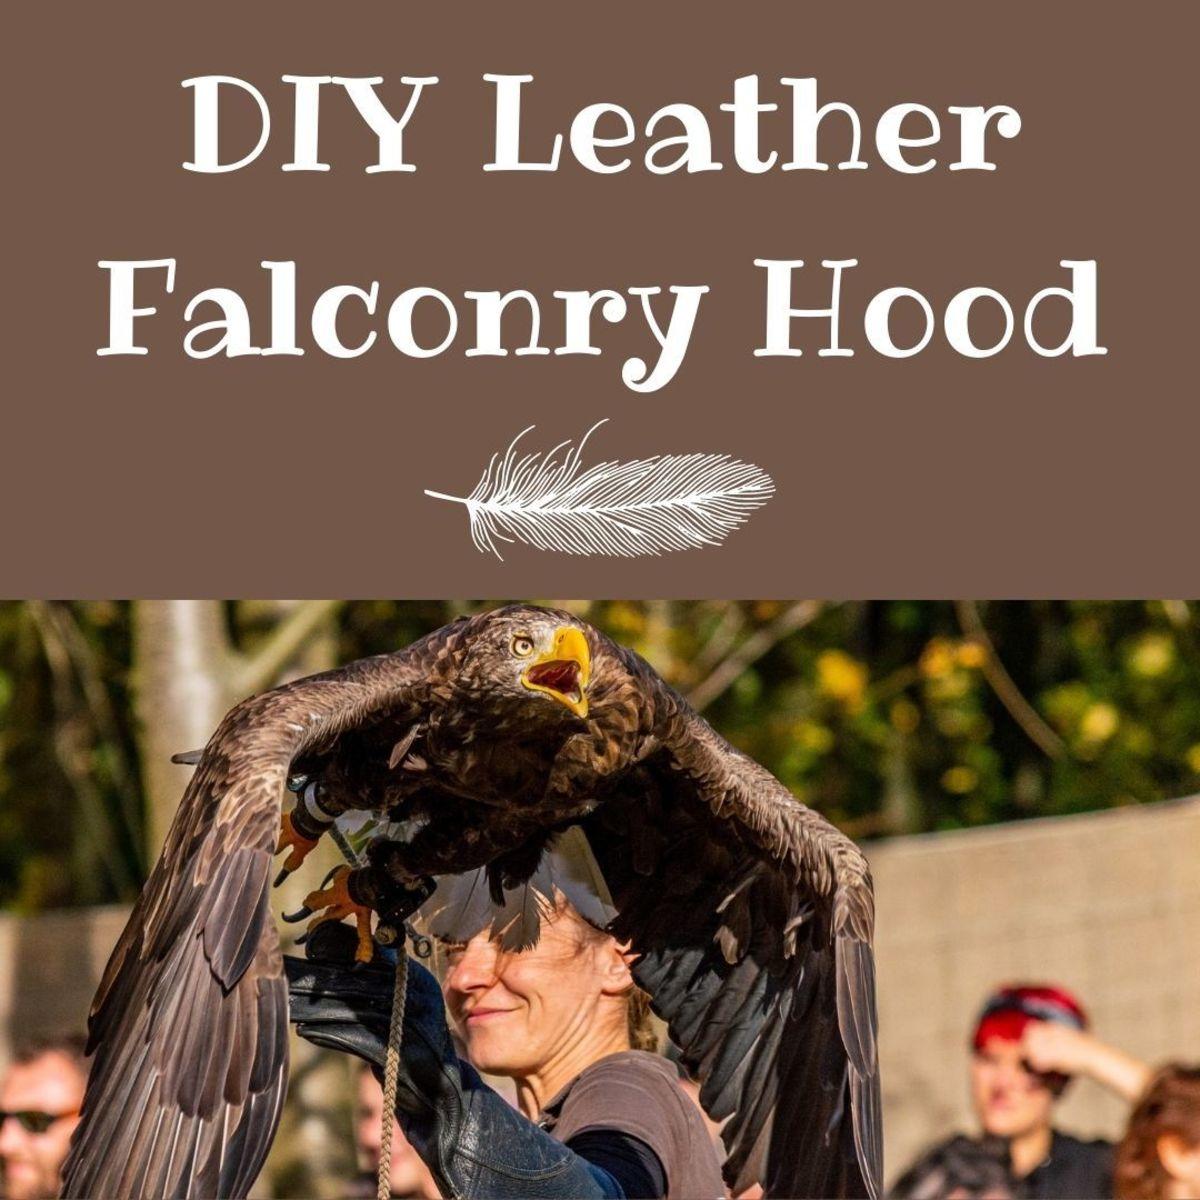 How to Make a DIY Leather Falconry Hood